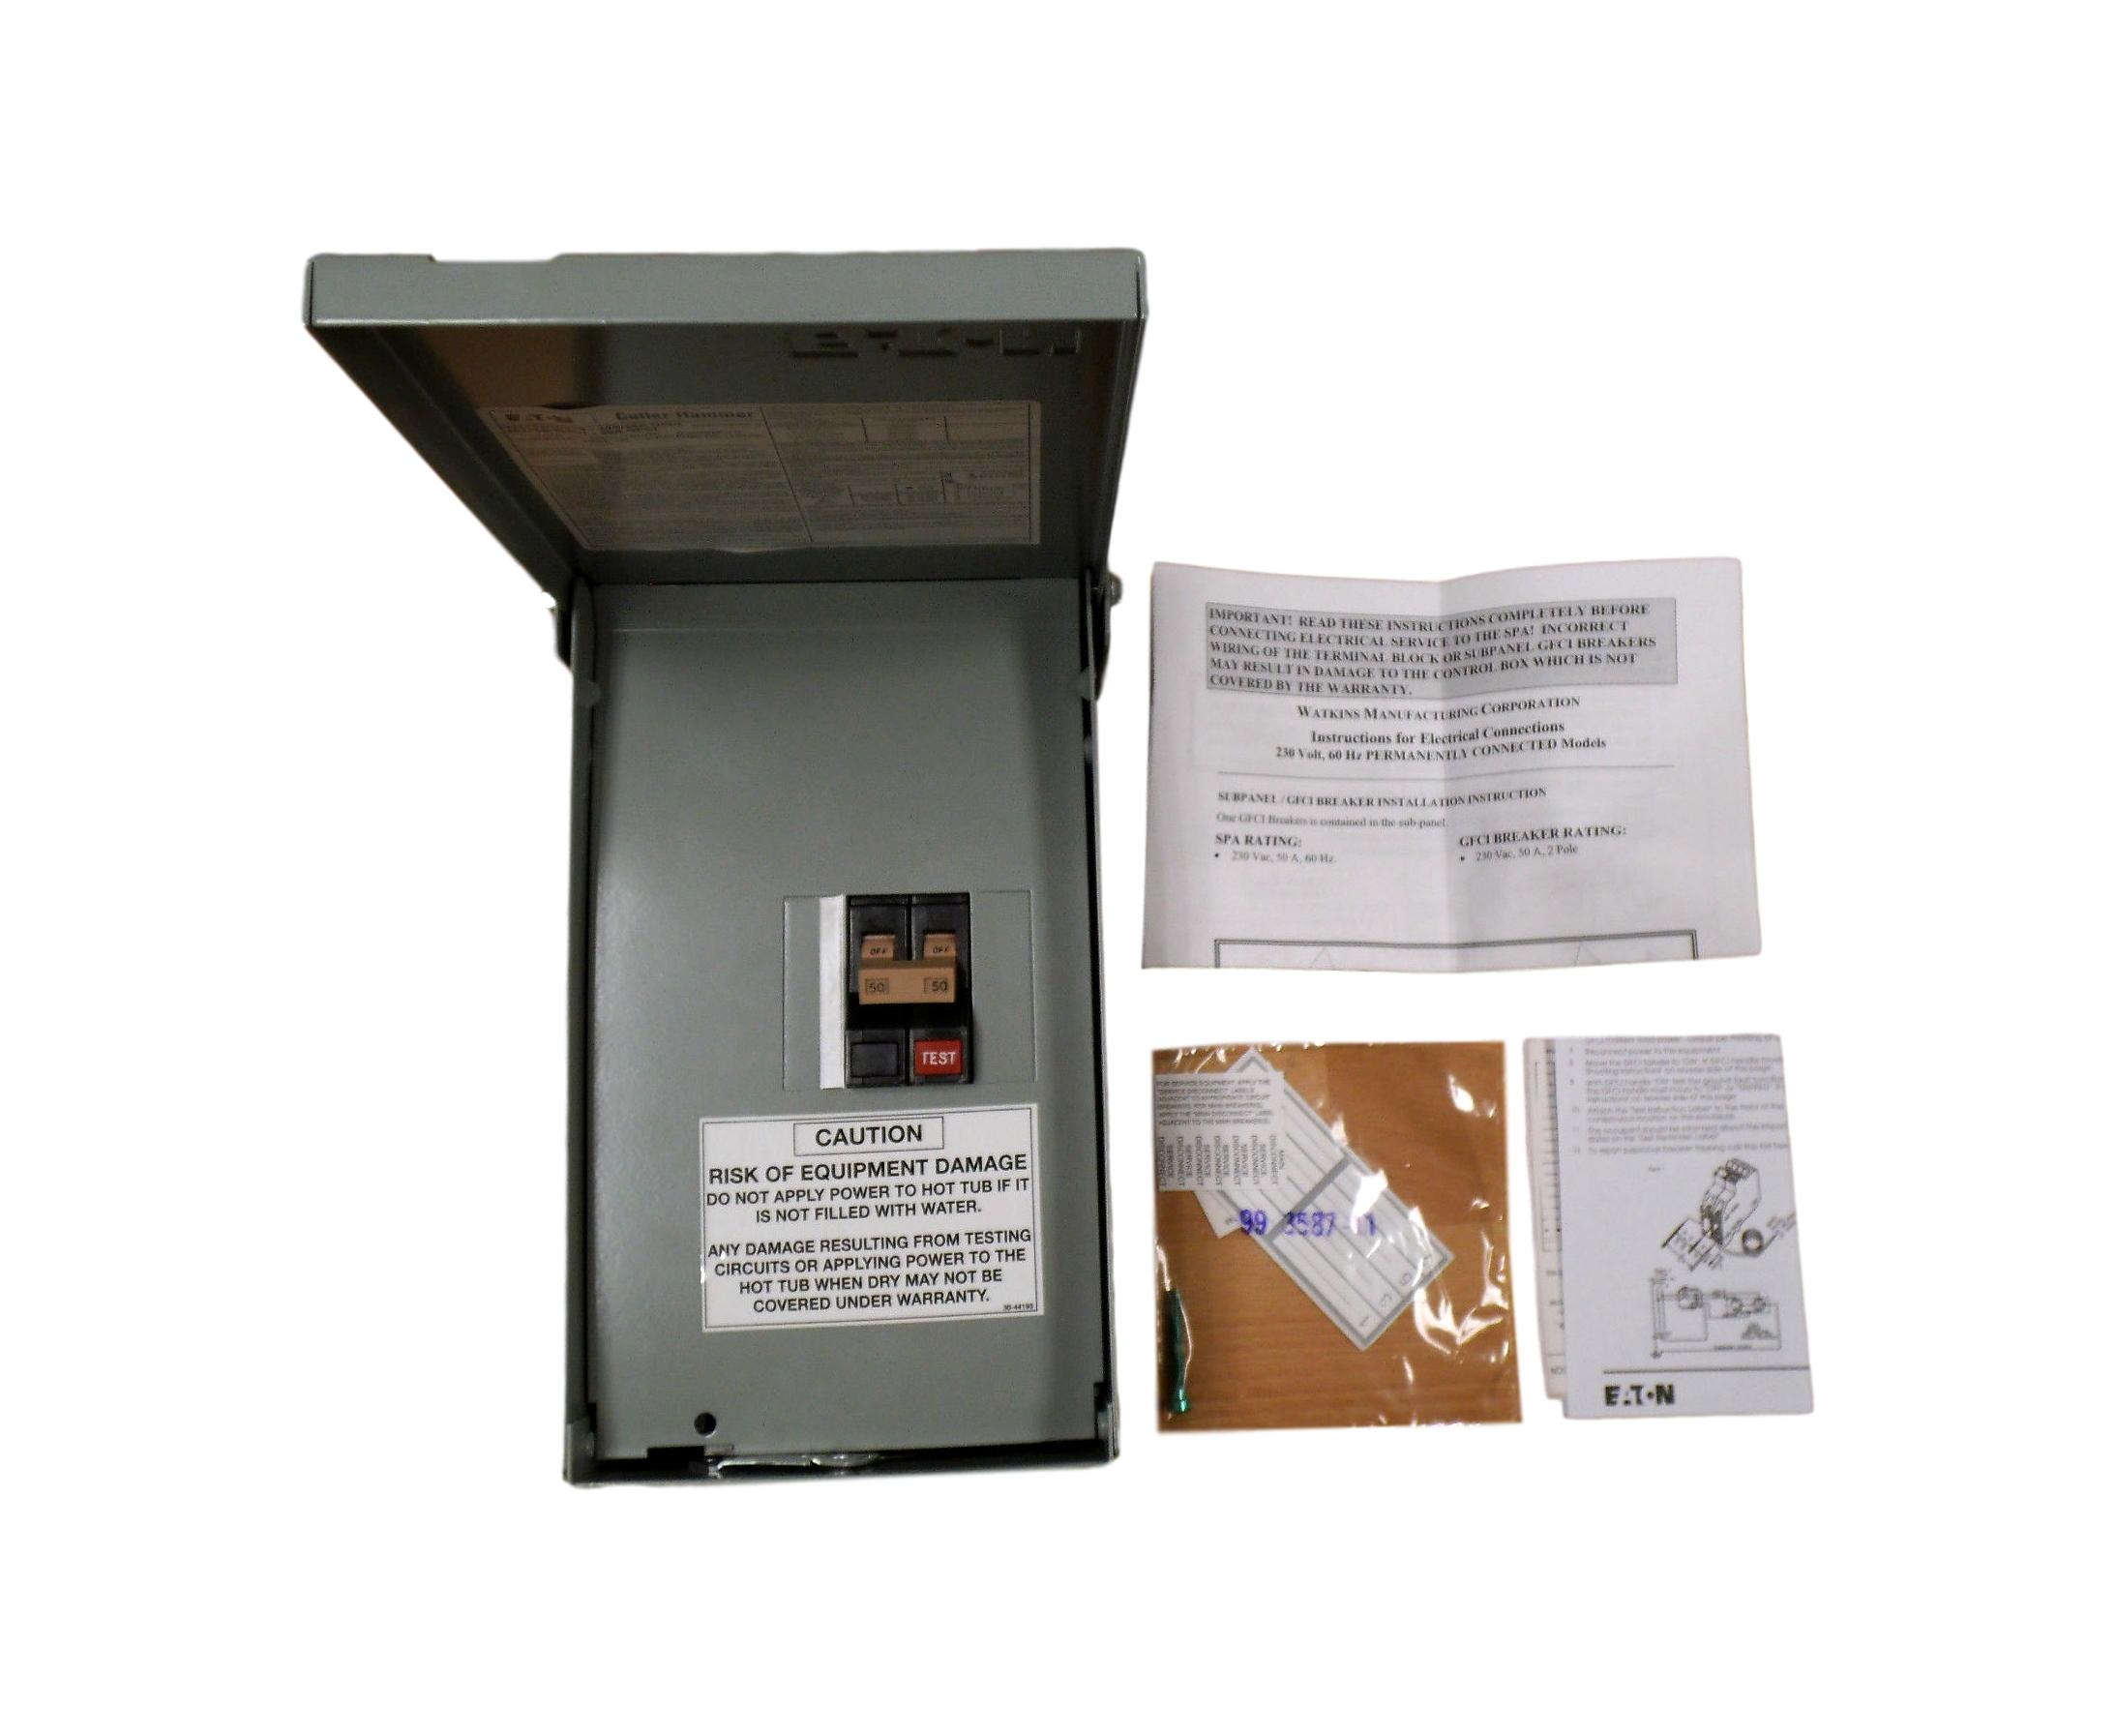 Watkins Wiring Panel Block And Schematic Diagrams 50 Amp Hot Tub Eaton 301758 230v Subpanel 4 Circuit Breaker Box Rh Ebay Com Sub